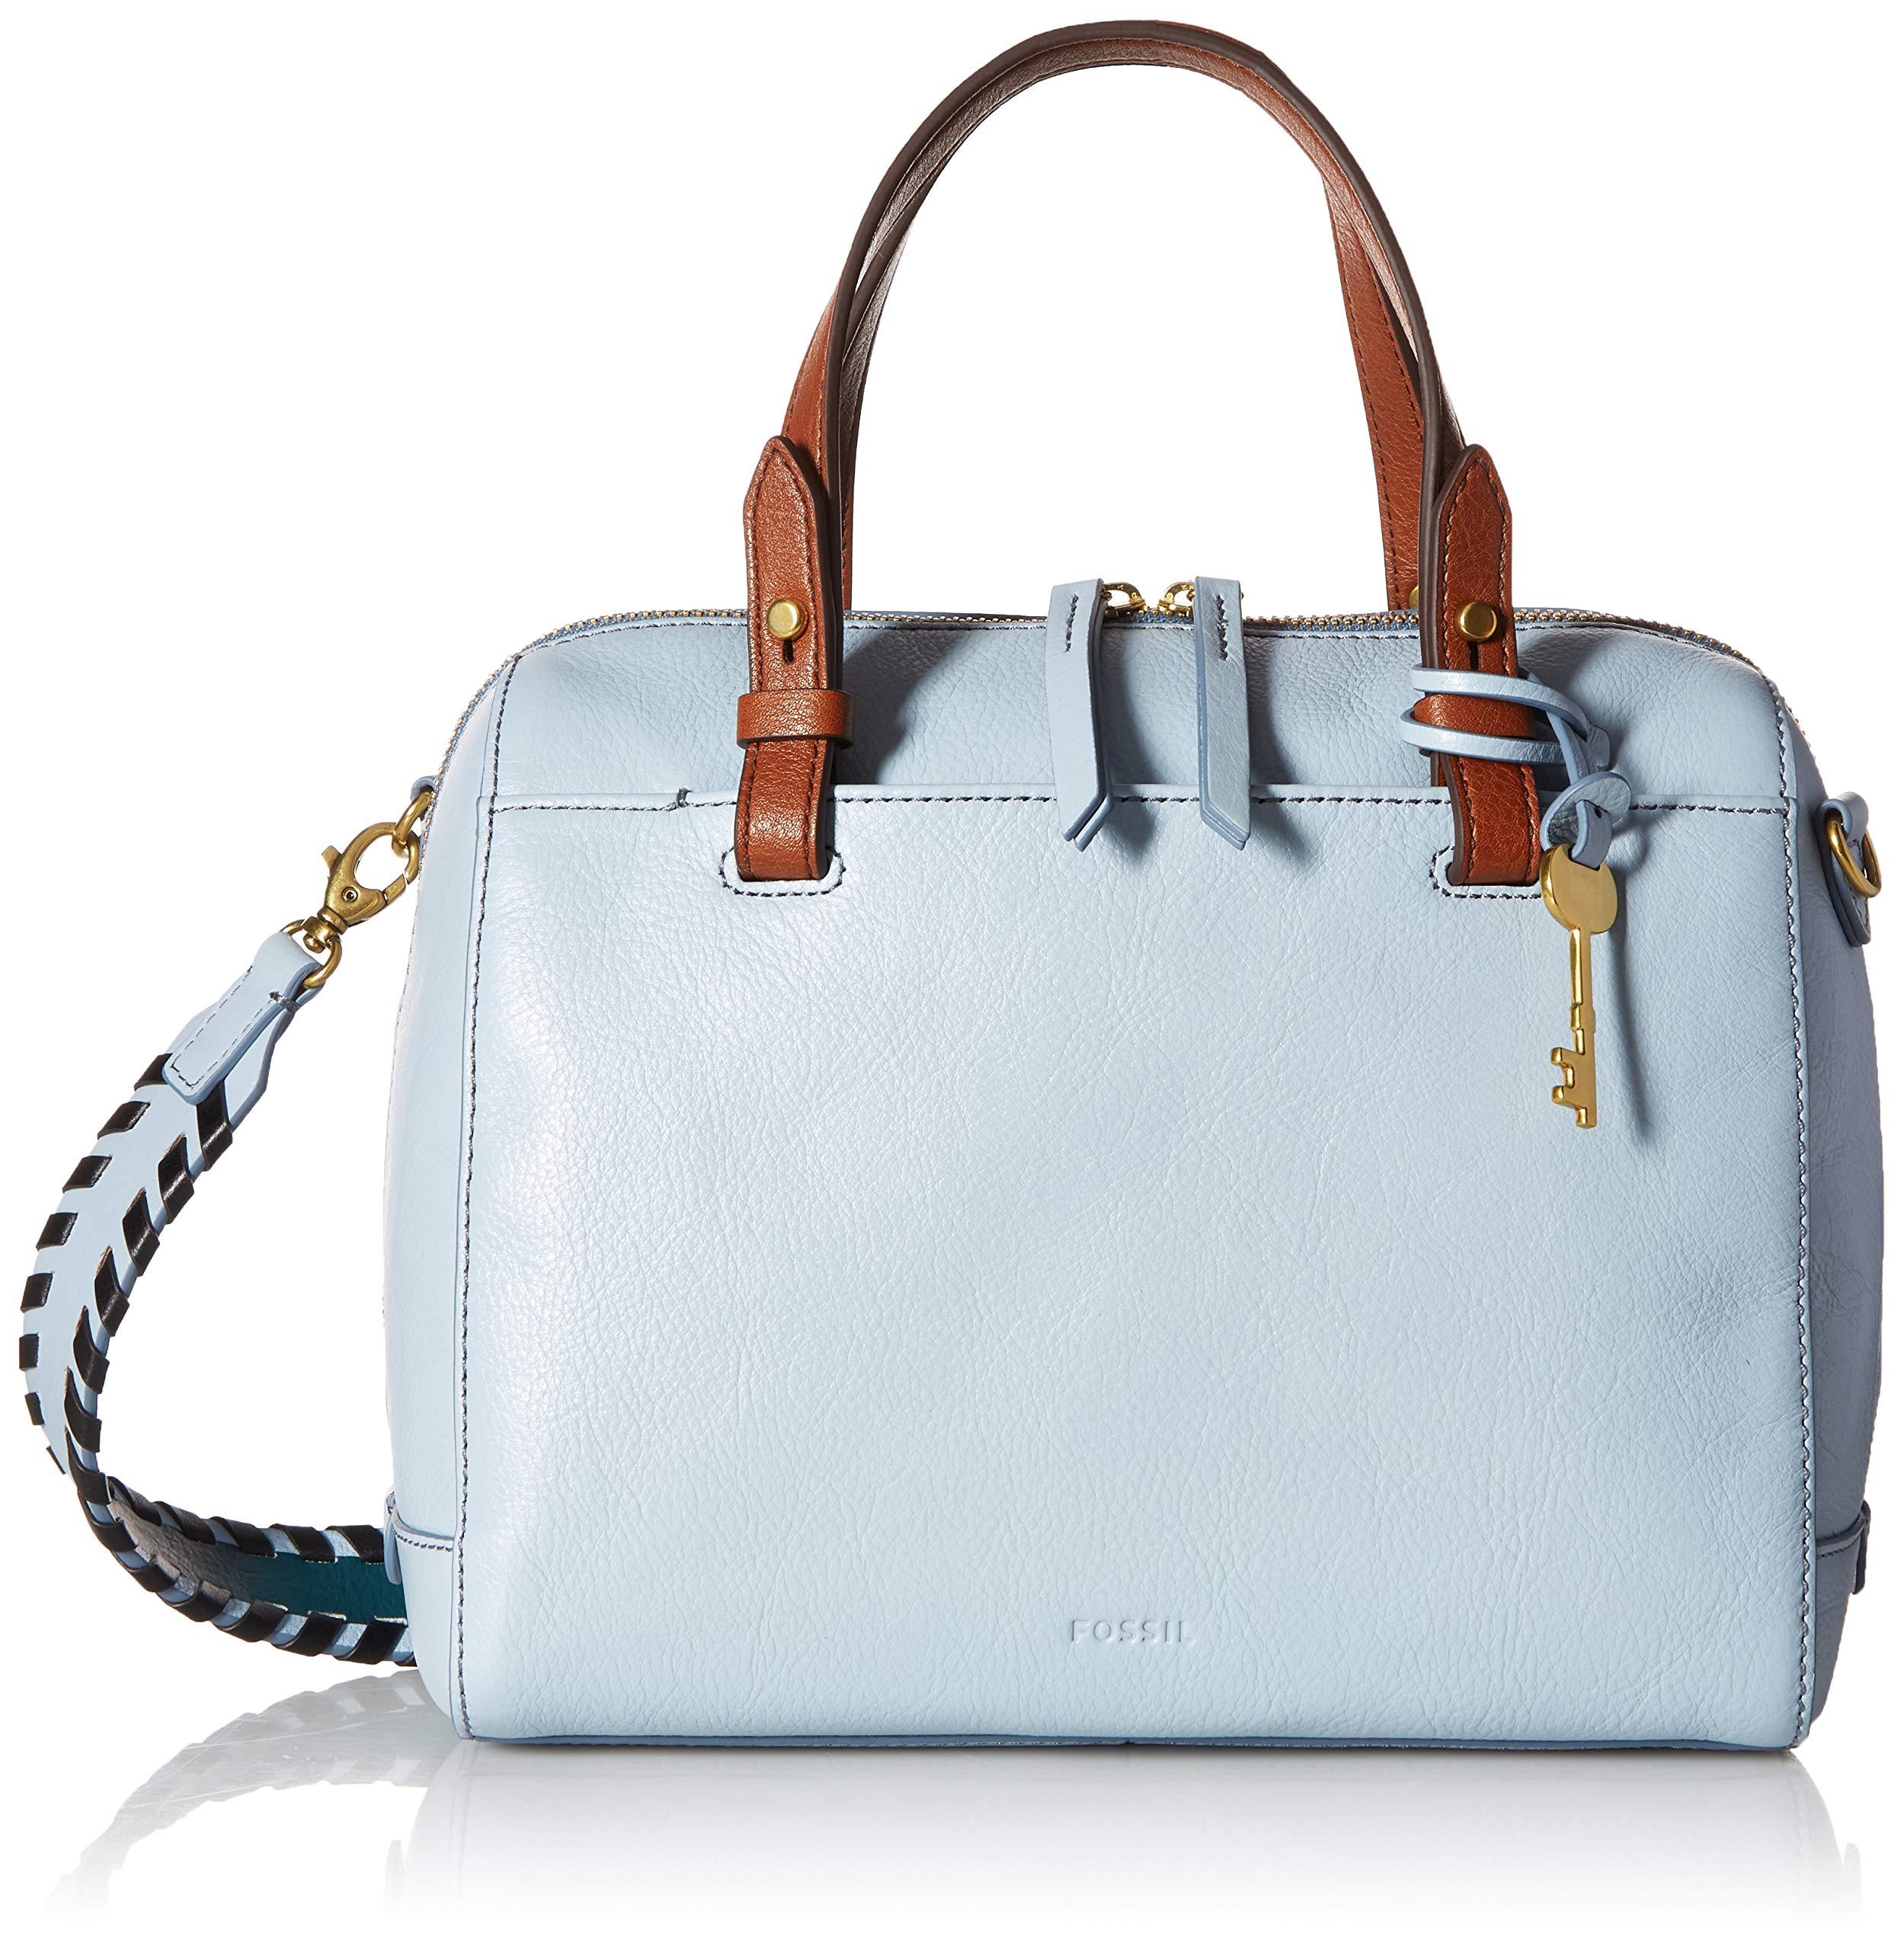 Fossil Rachel Satchel Handbag, Horizon Blue